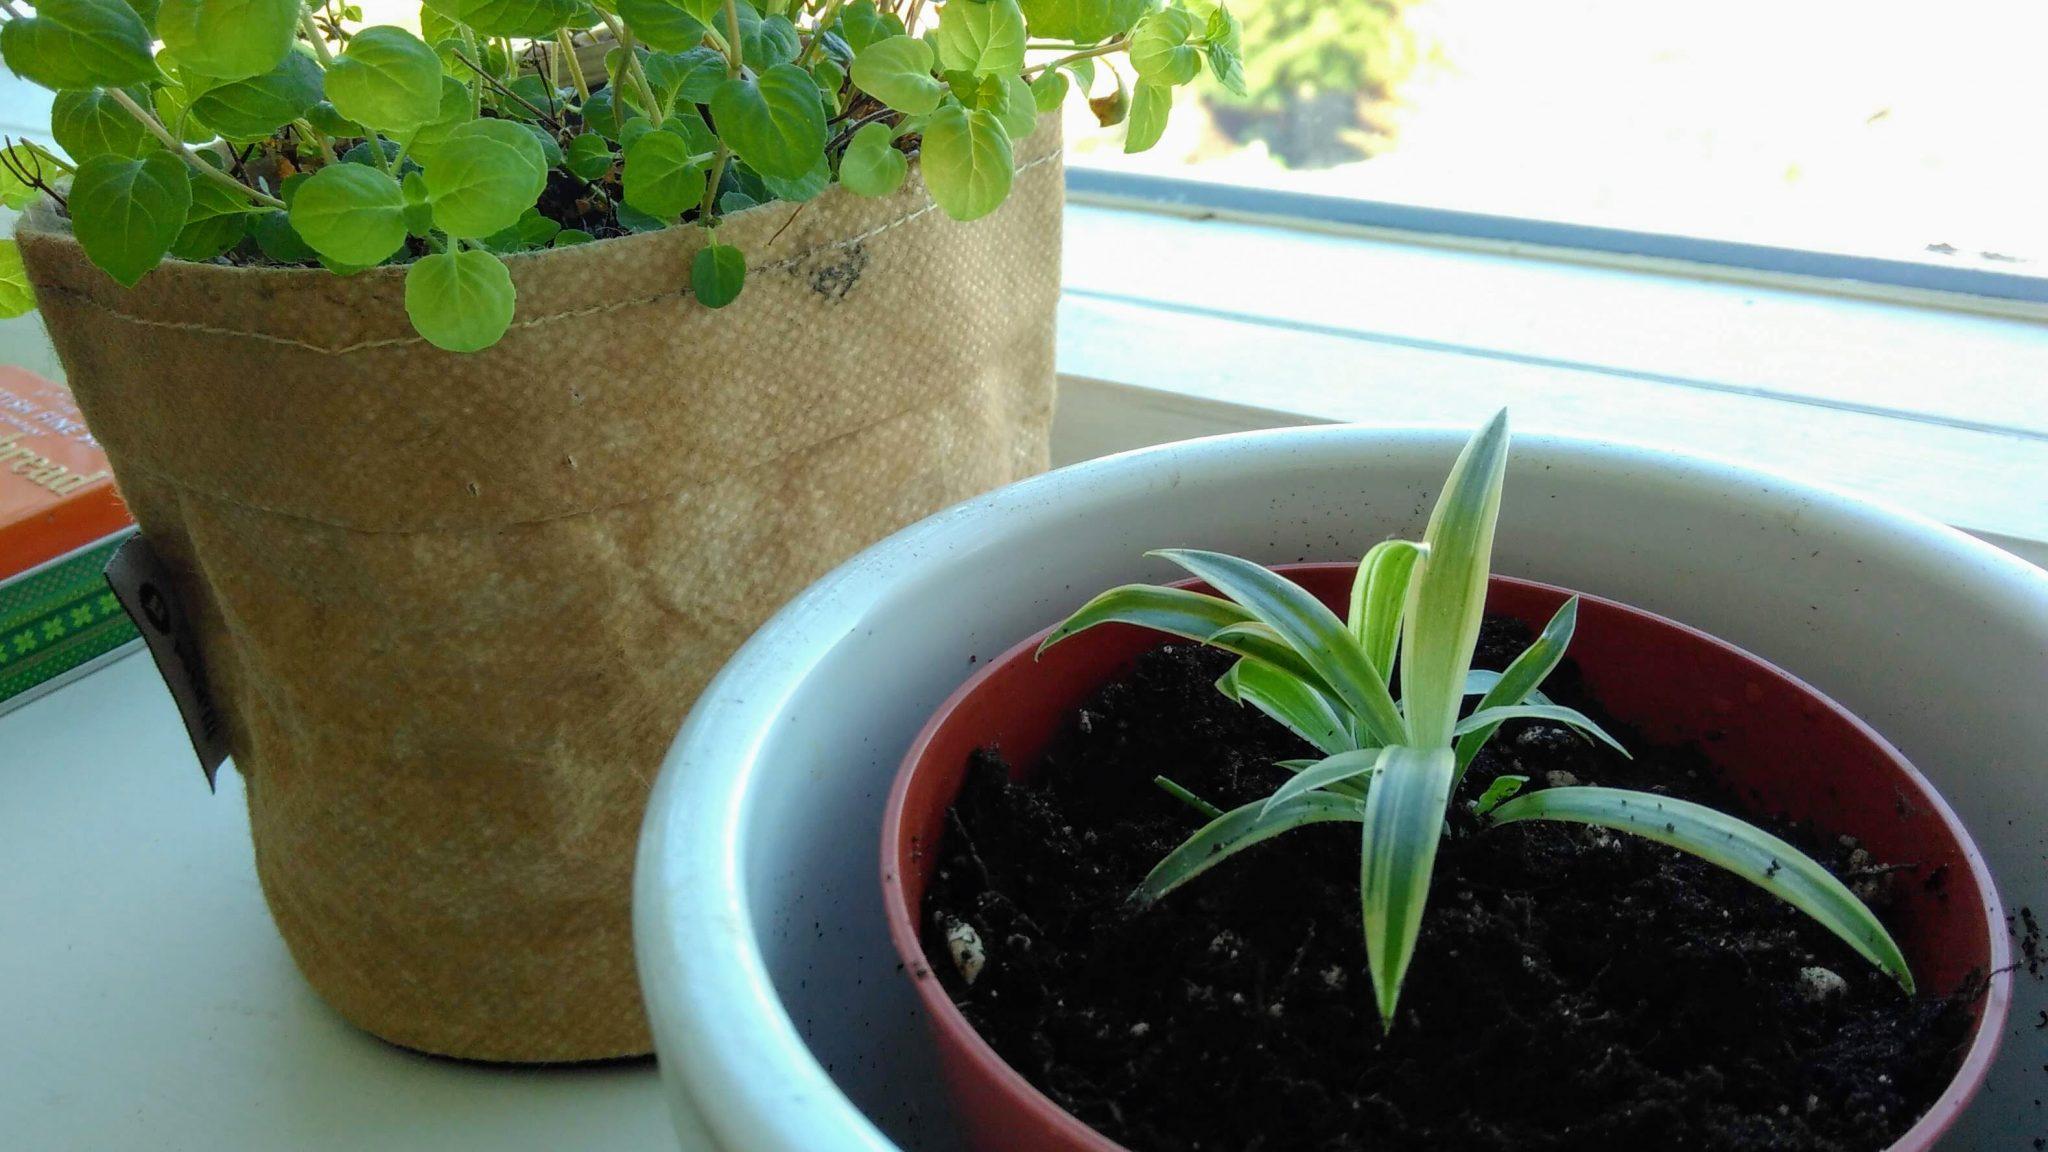 Over groene vingers en spider plants